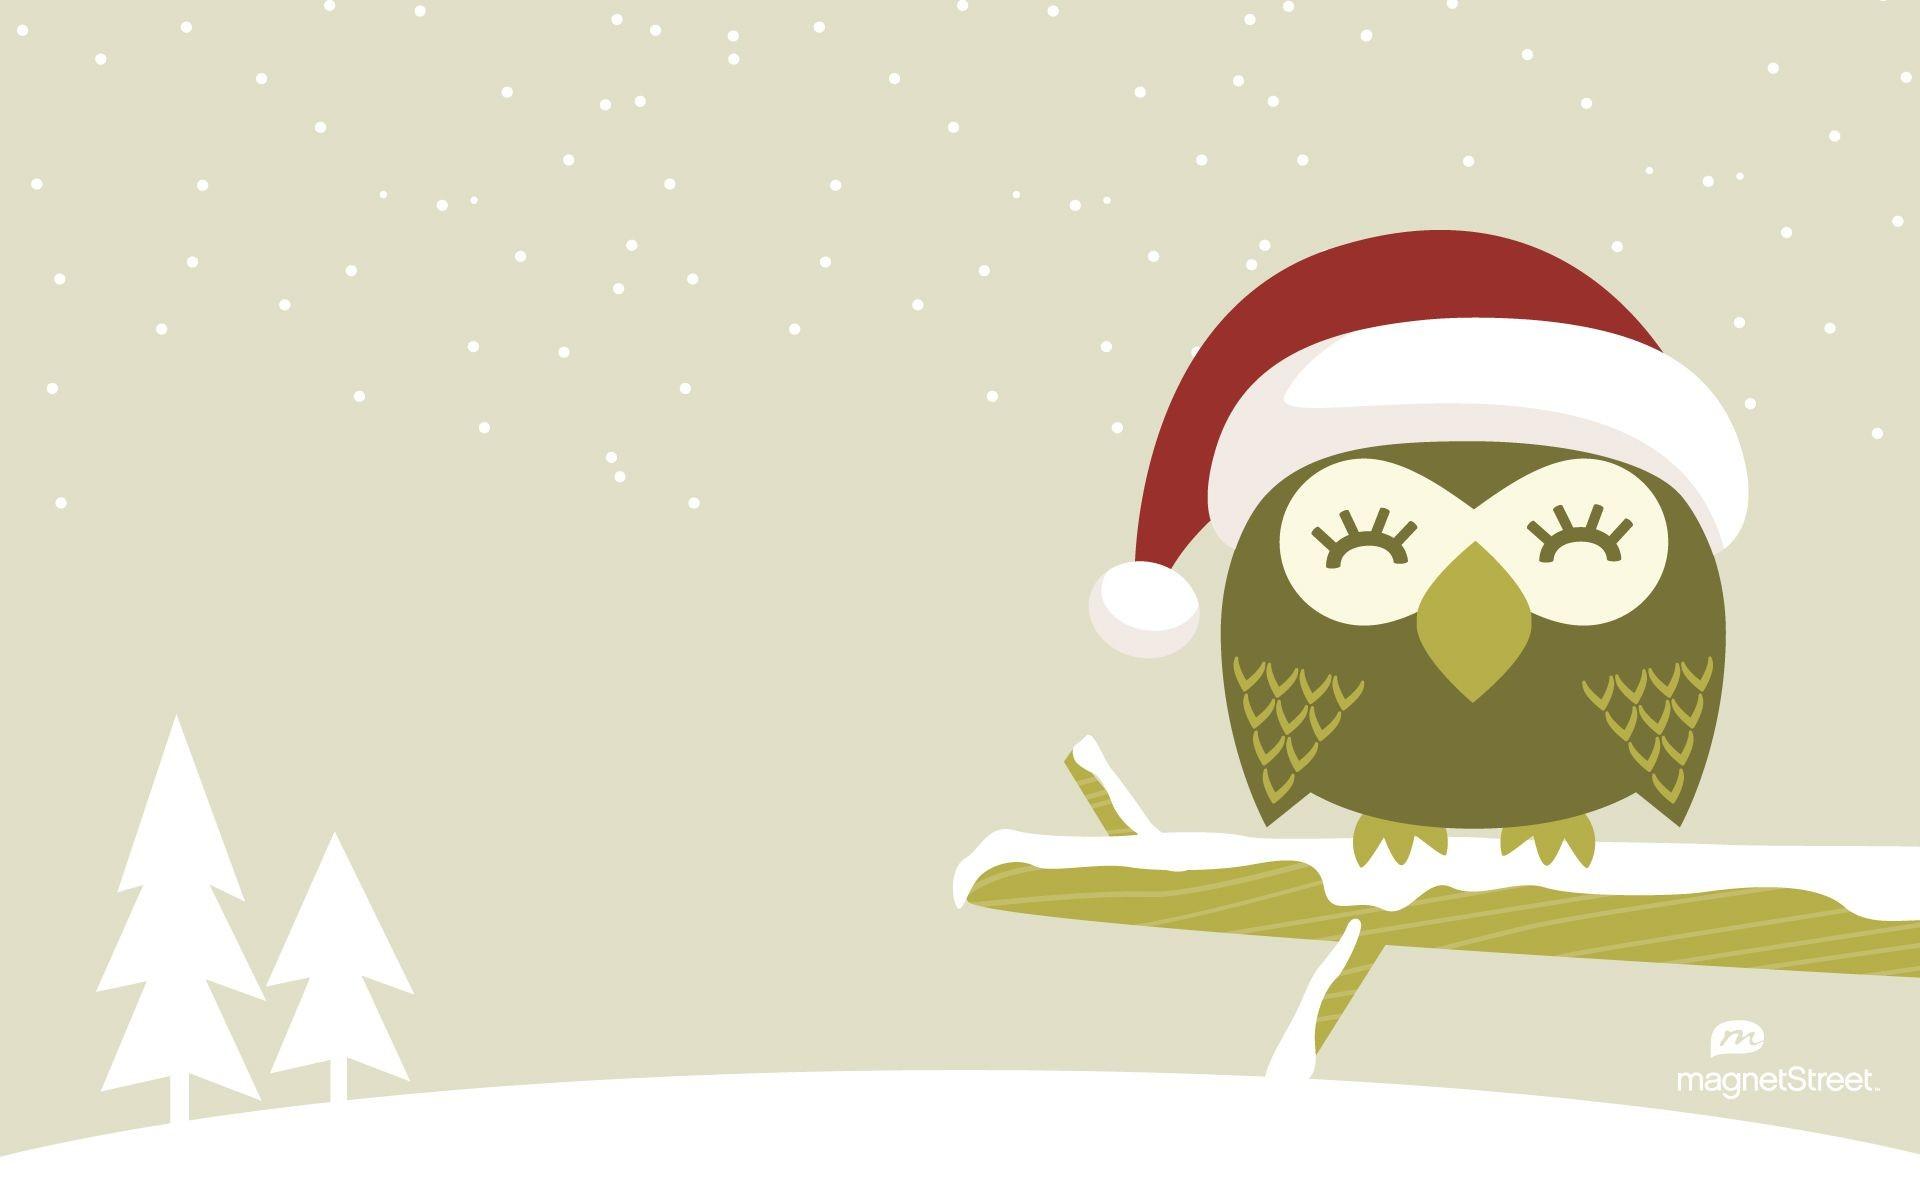 Wallpapers For > Cute Owl Desktop Wallpaper Hd